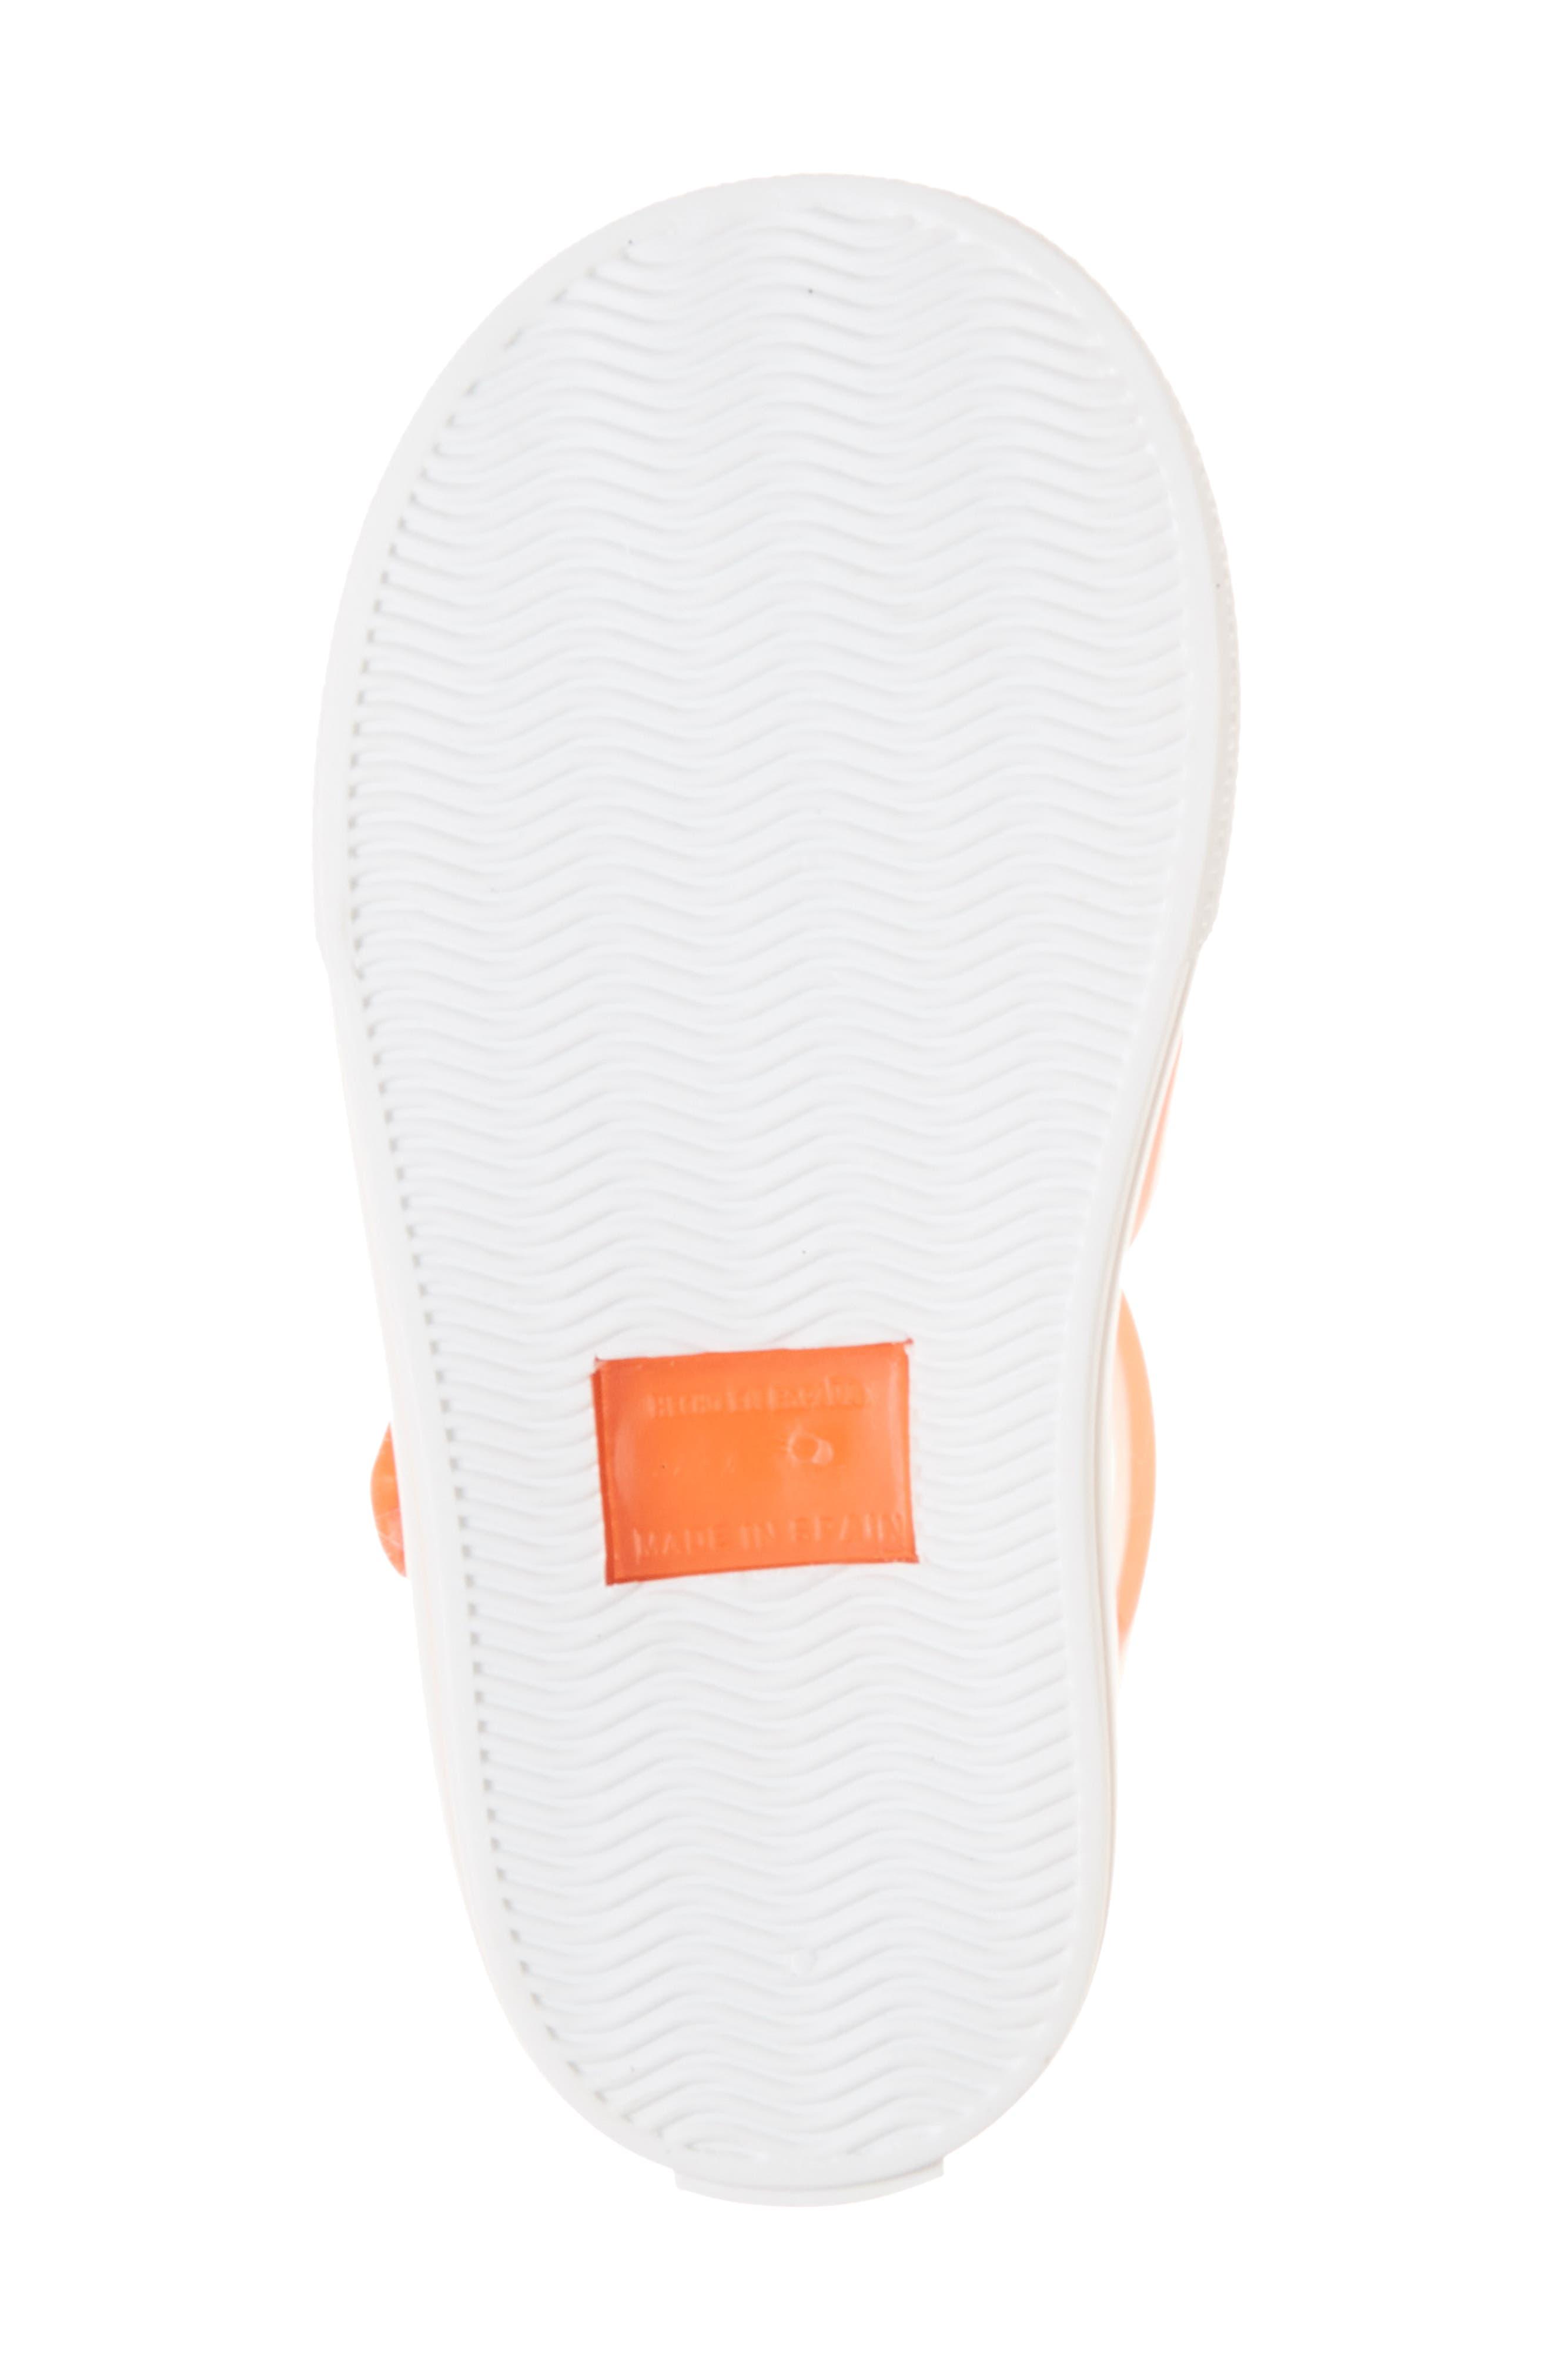 Tenis Fisherman Jelly Sandal,                             Alternate thumbnail 6, color,                             Crystal Neon Orange